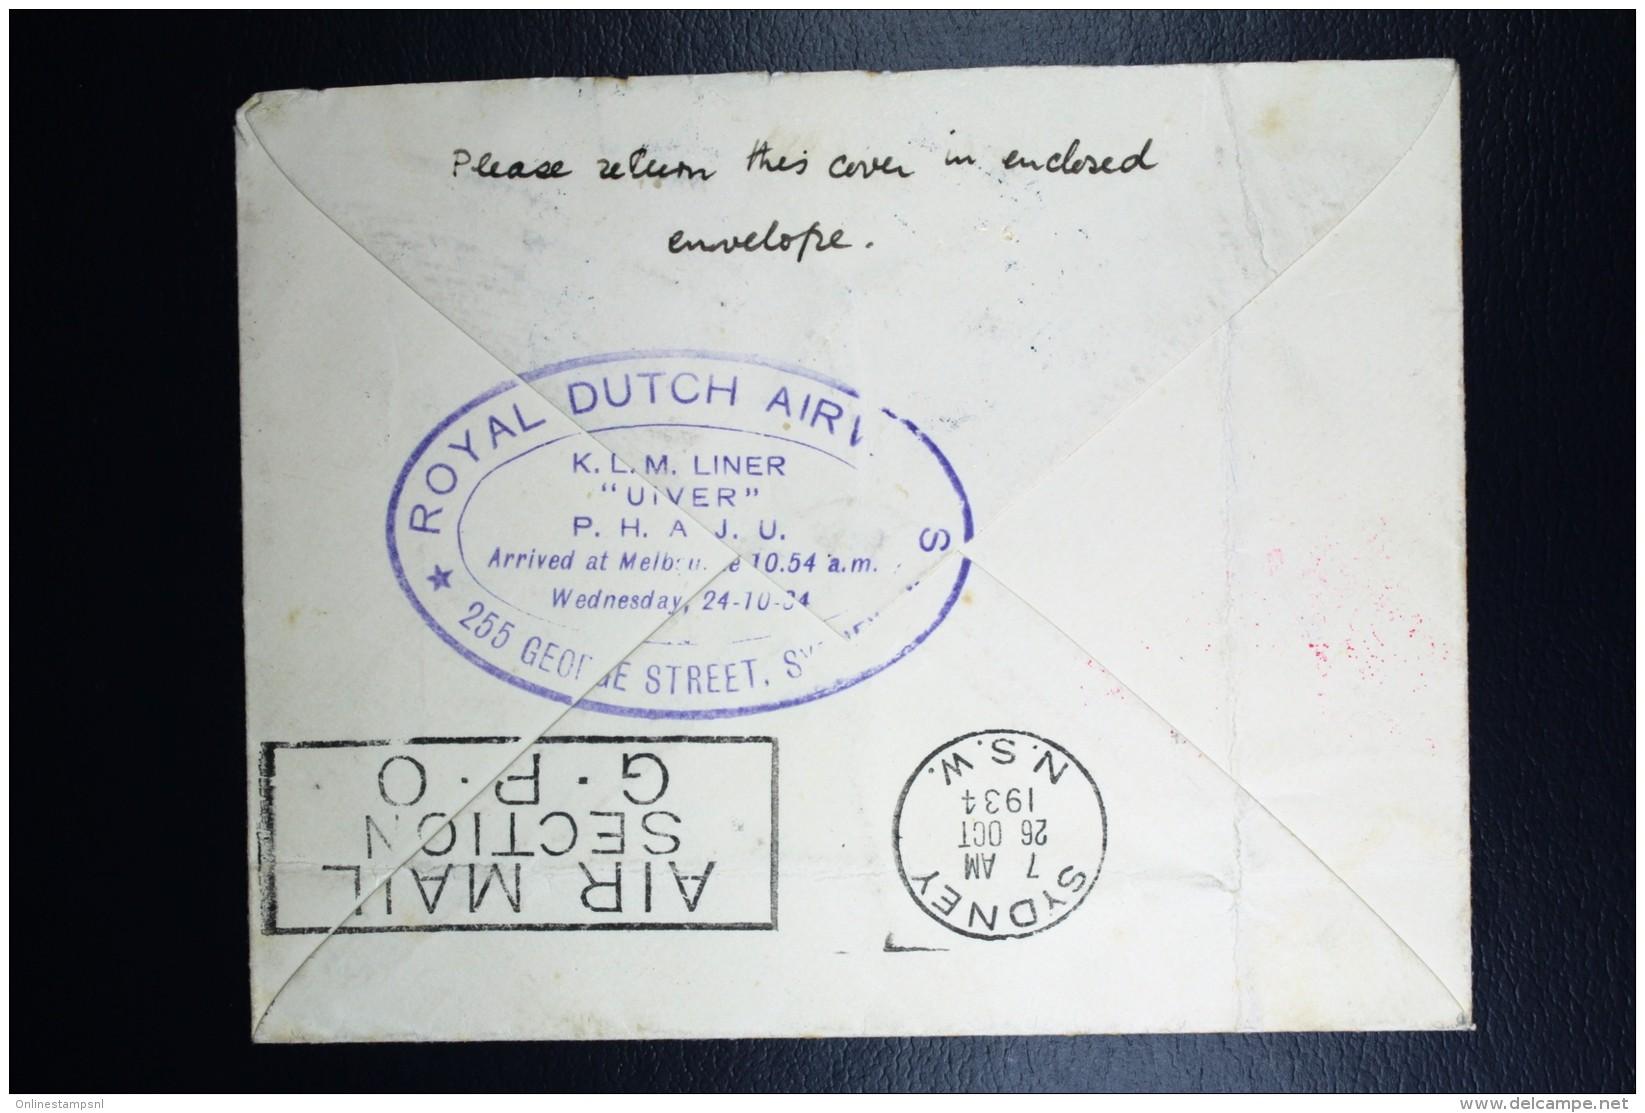 Netherlands: Mac Robertson Air Race UIVER PH.AJU Den Haag London Sydney  Vlieg Hol 98  1934 - Periode 1891-1948 (Wilhelmina)